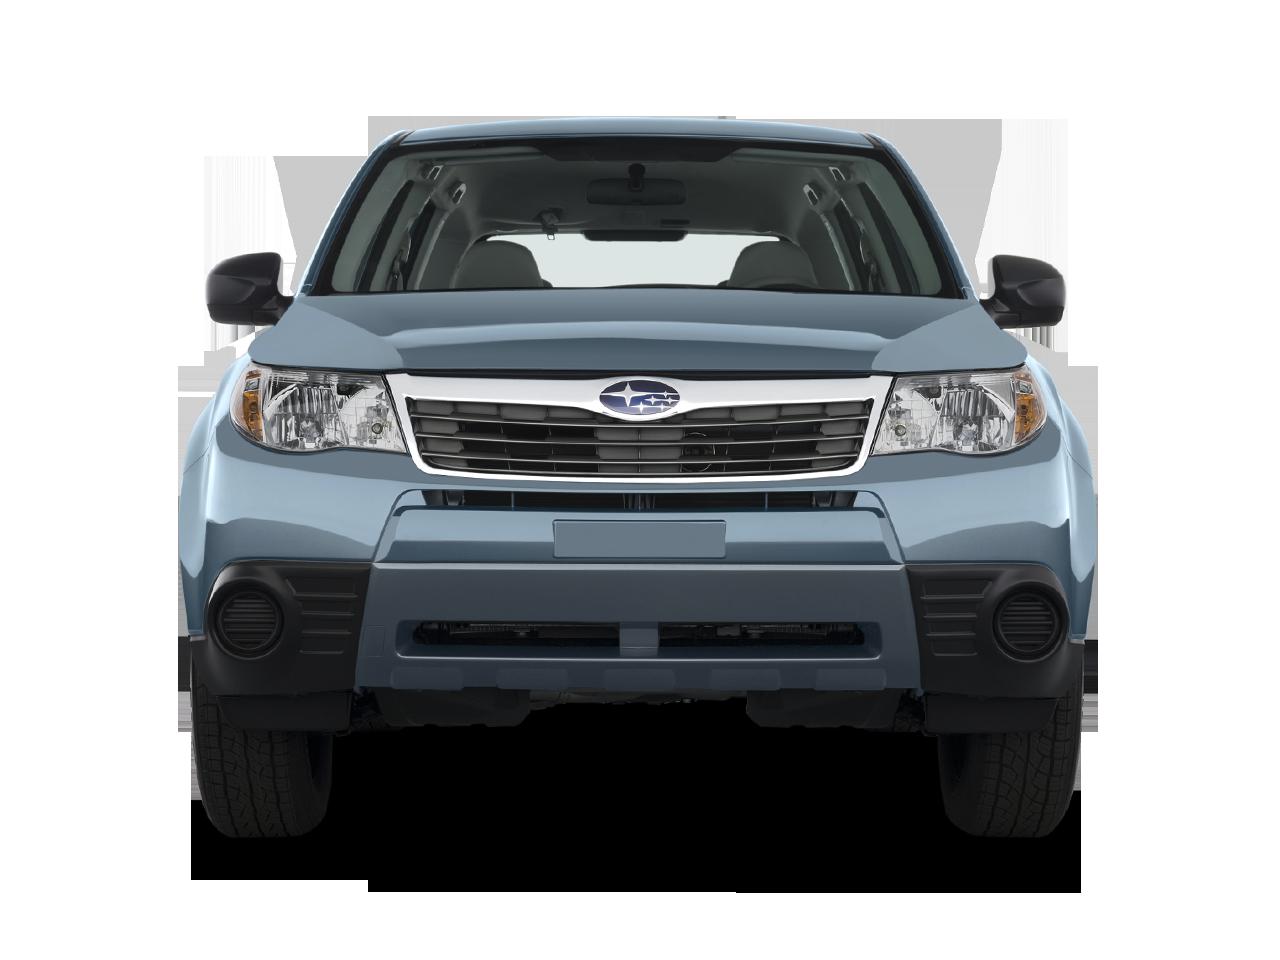 Subaru Forester Review 2015 >> 2009 Subaru Forester 2.5XT Limited - Subaru Compact SUV Review - Automobile Magazine